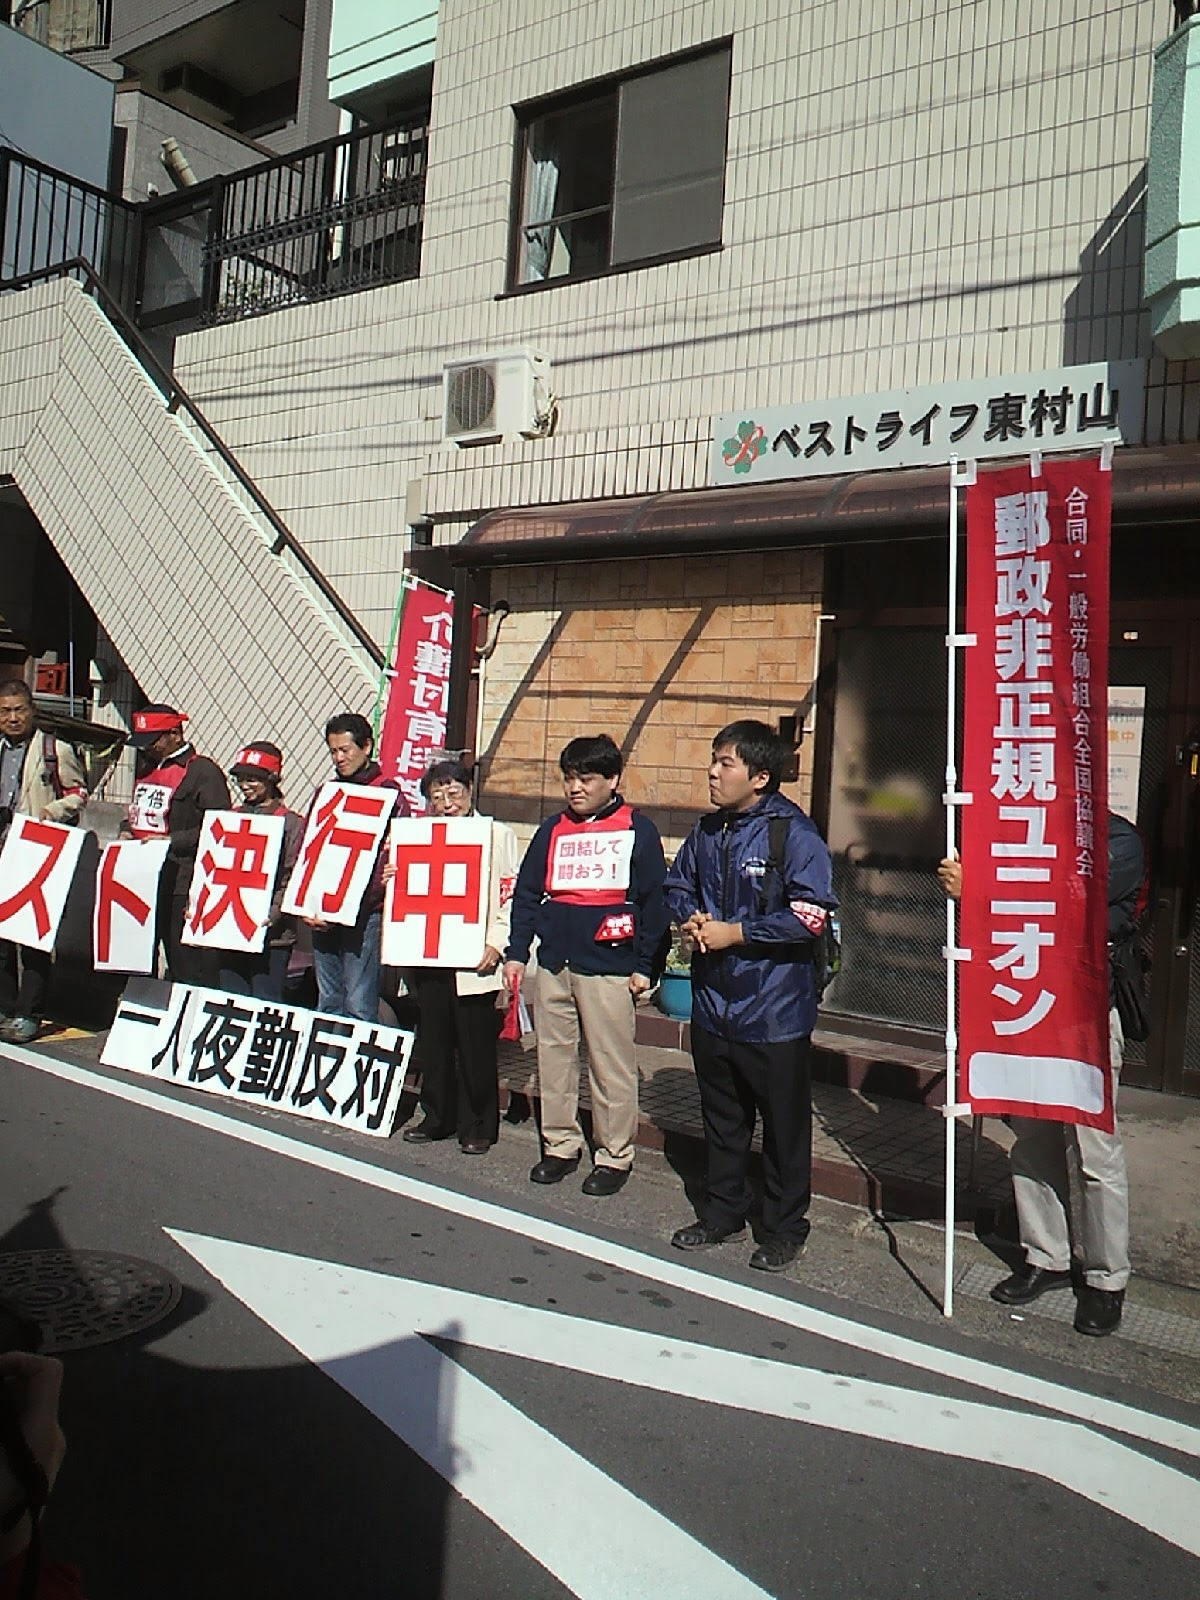 http://gorohachi.blogspot.jp/2014/10/blog-post_90.html